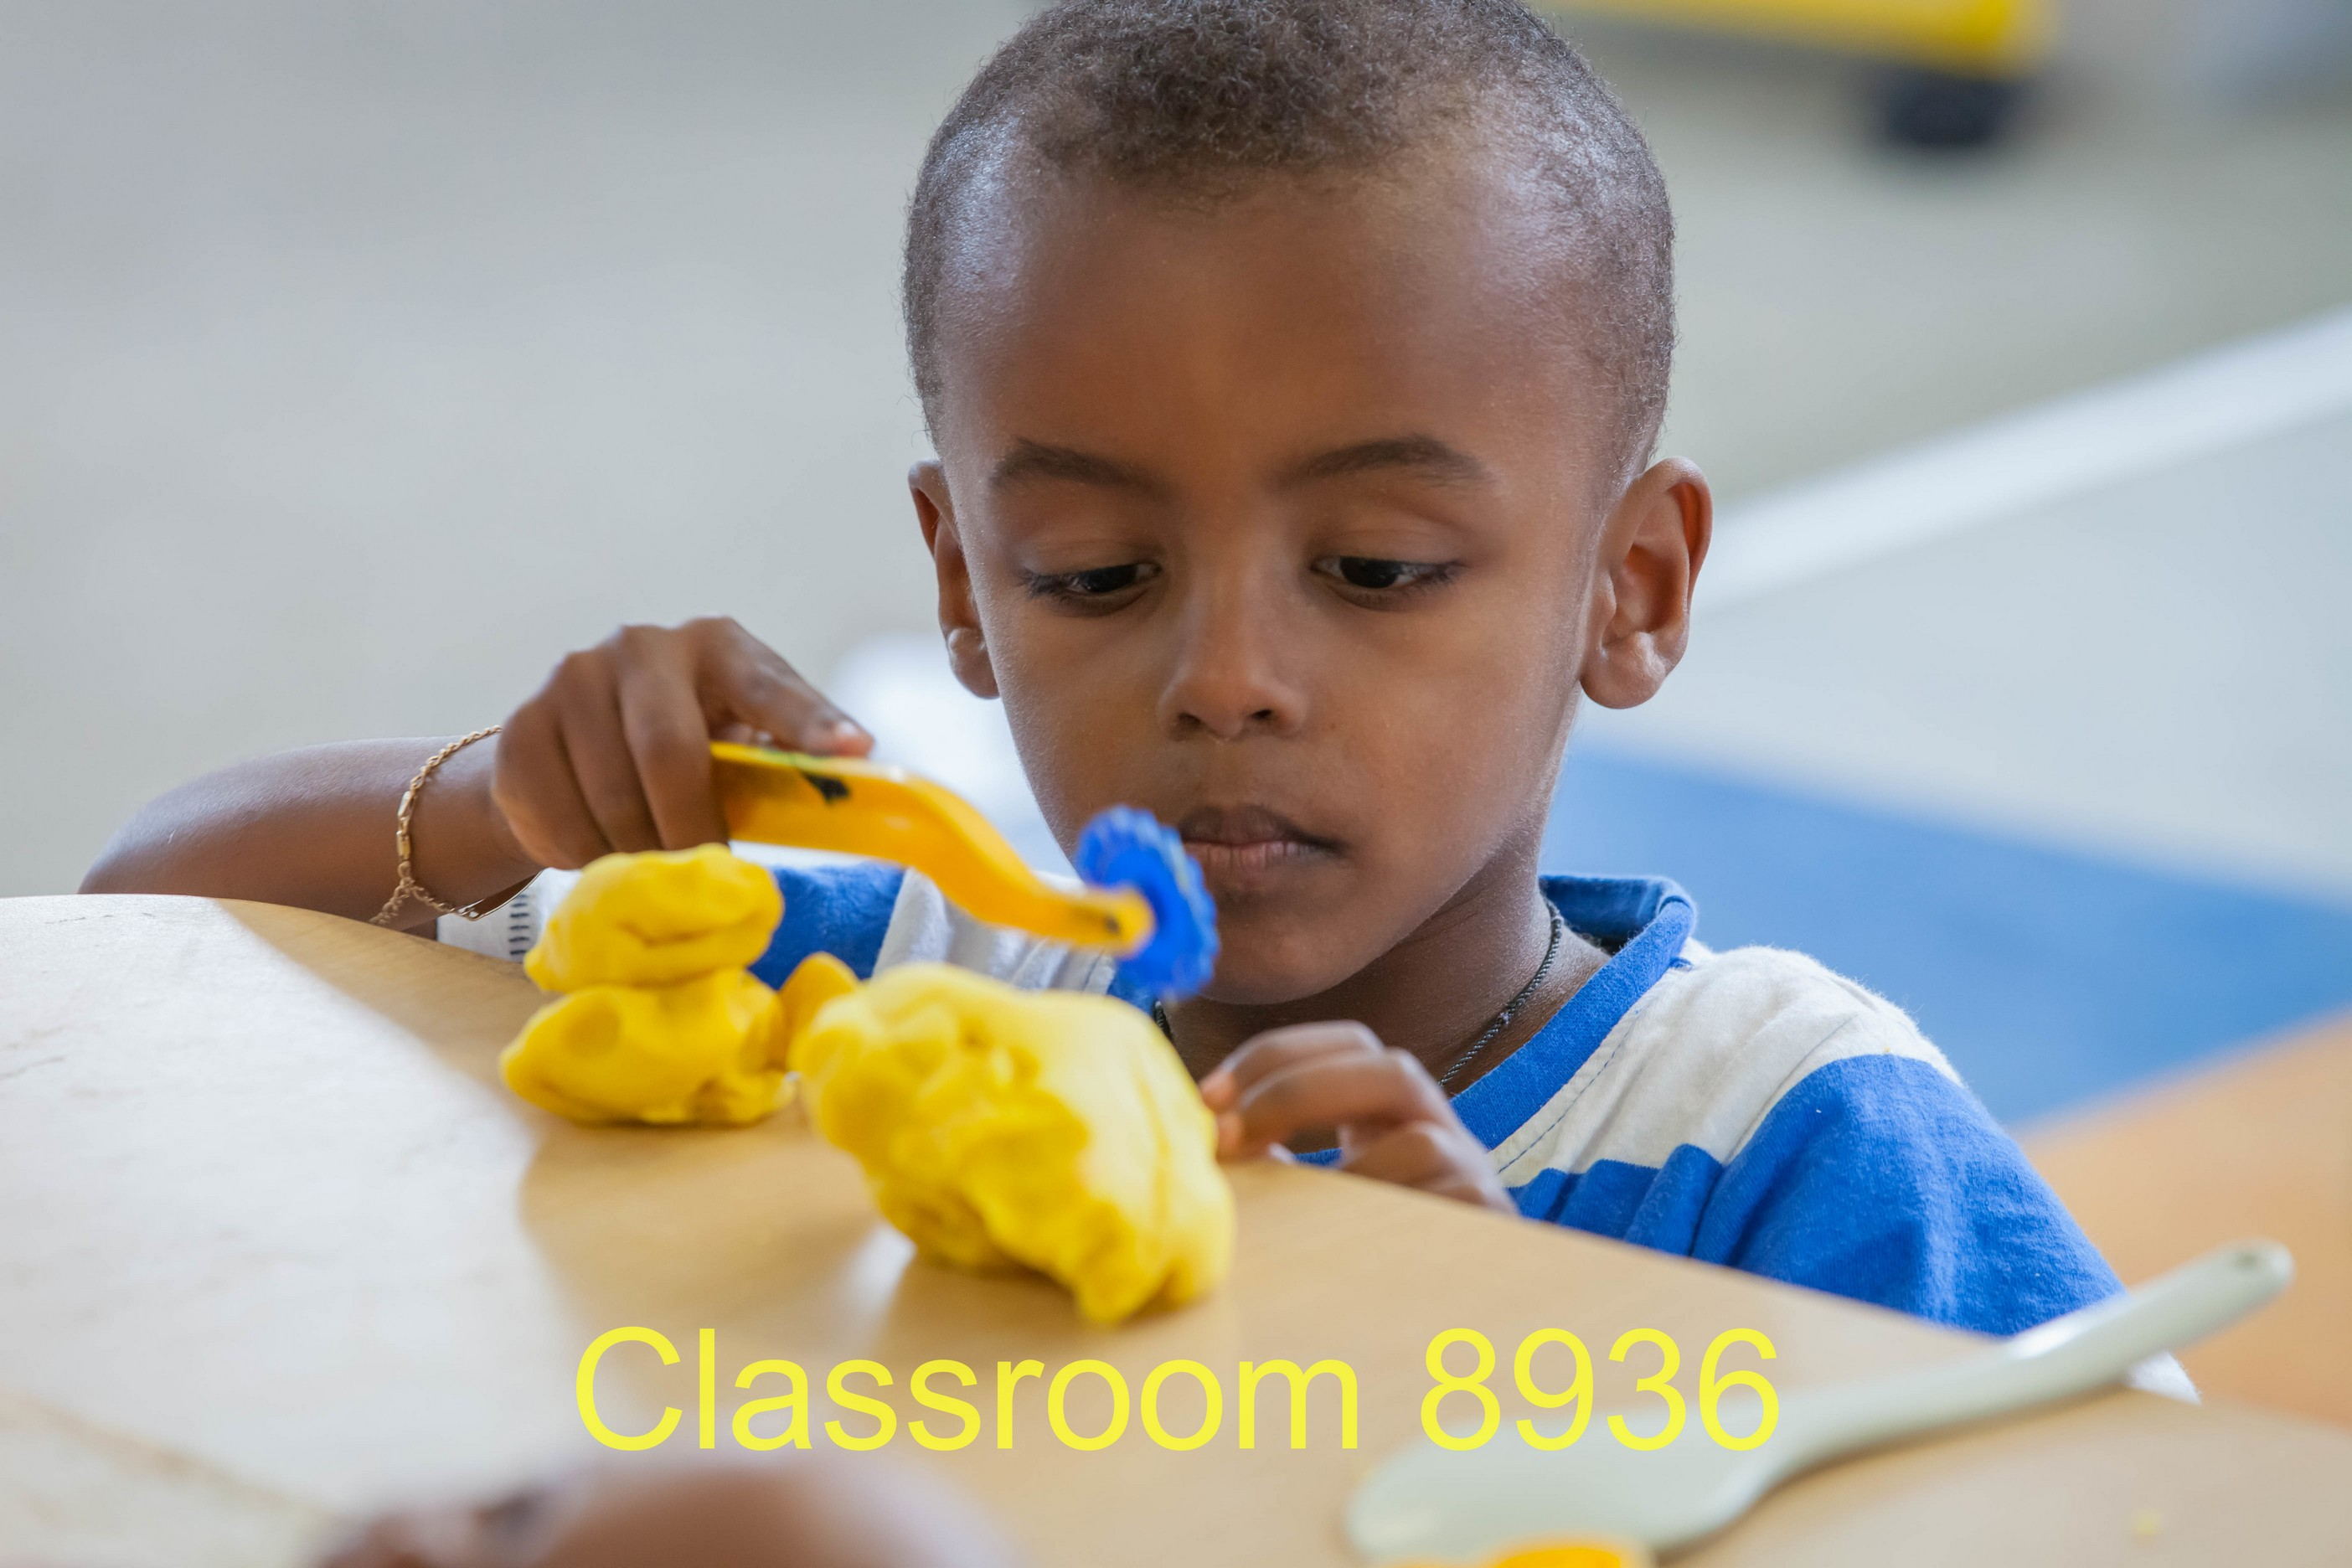 Classroom 8936